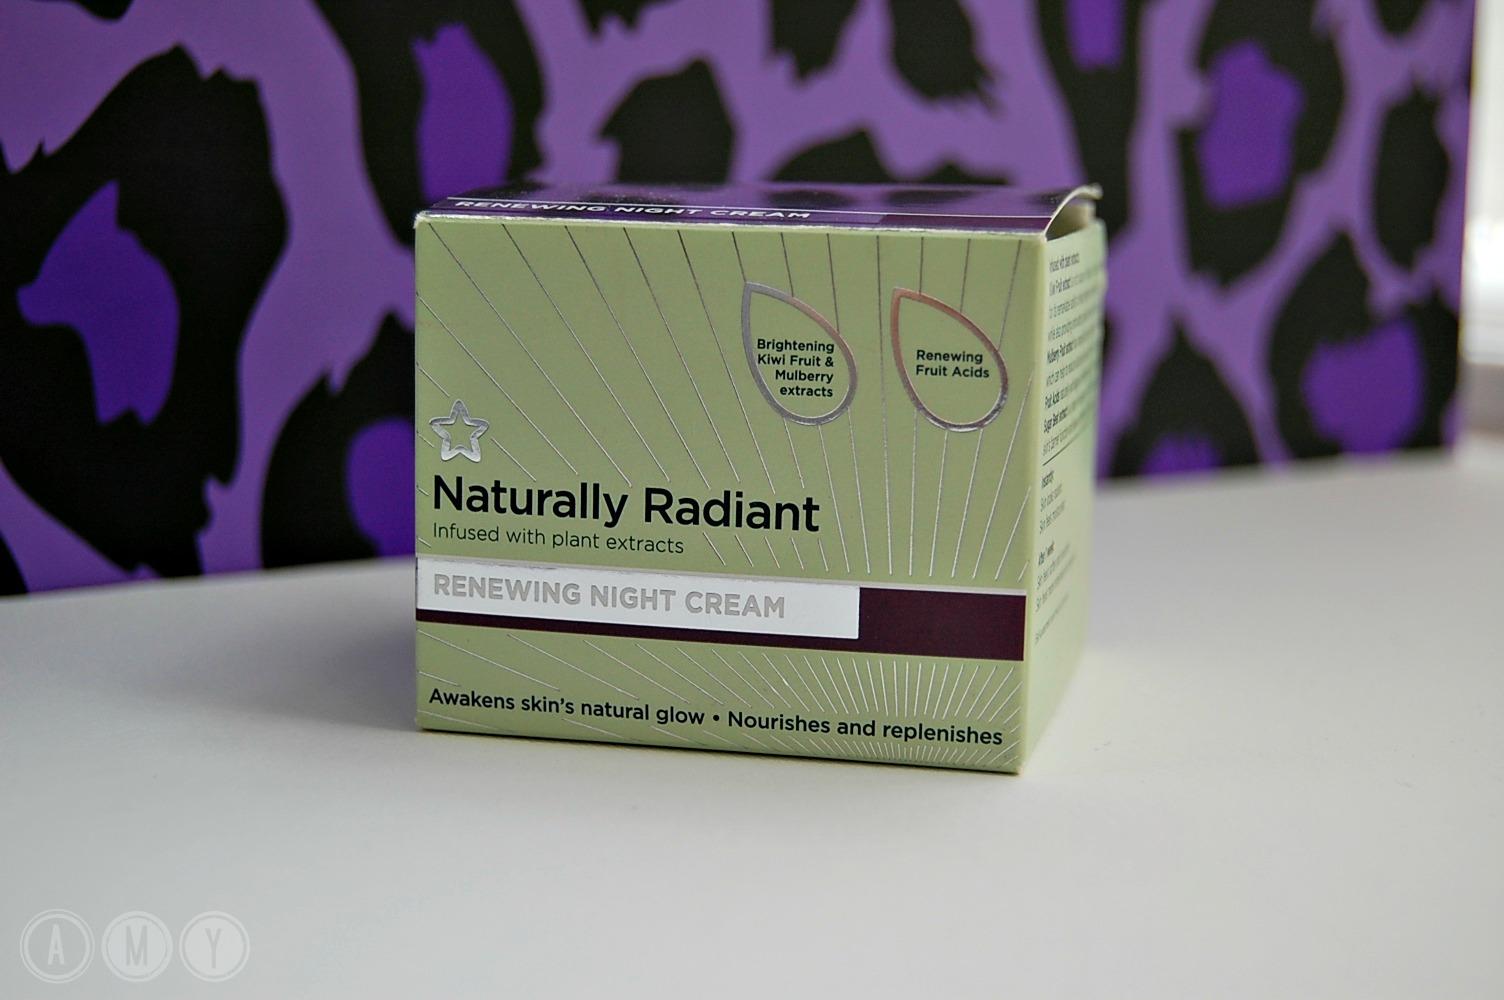 Superdrug Naturally Radiant Renewing Night Cream